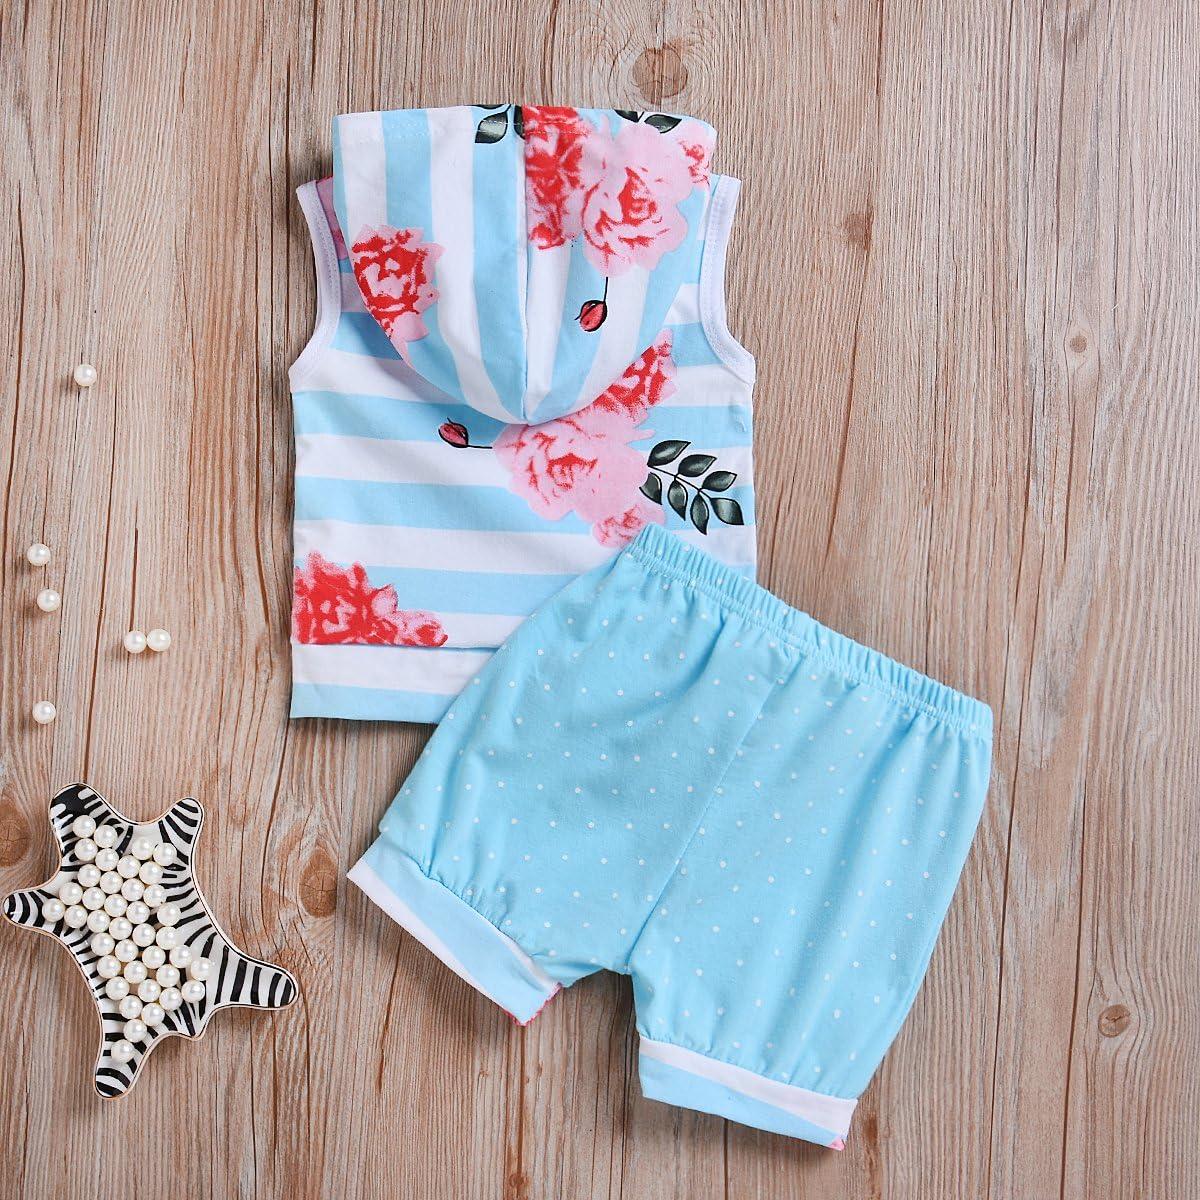 Mekilyn 2Pcs Baby Boy Girls Striped Sleeveless Hoodies T-Shirt Top+Floral Dot Short Pant Kids Playwear Outfit